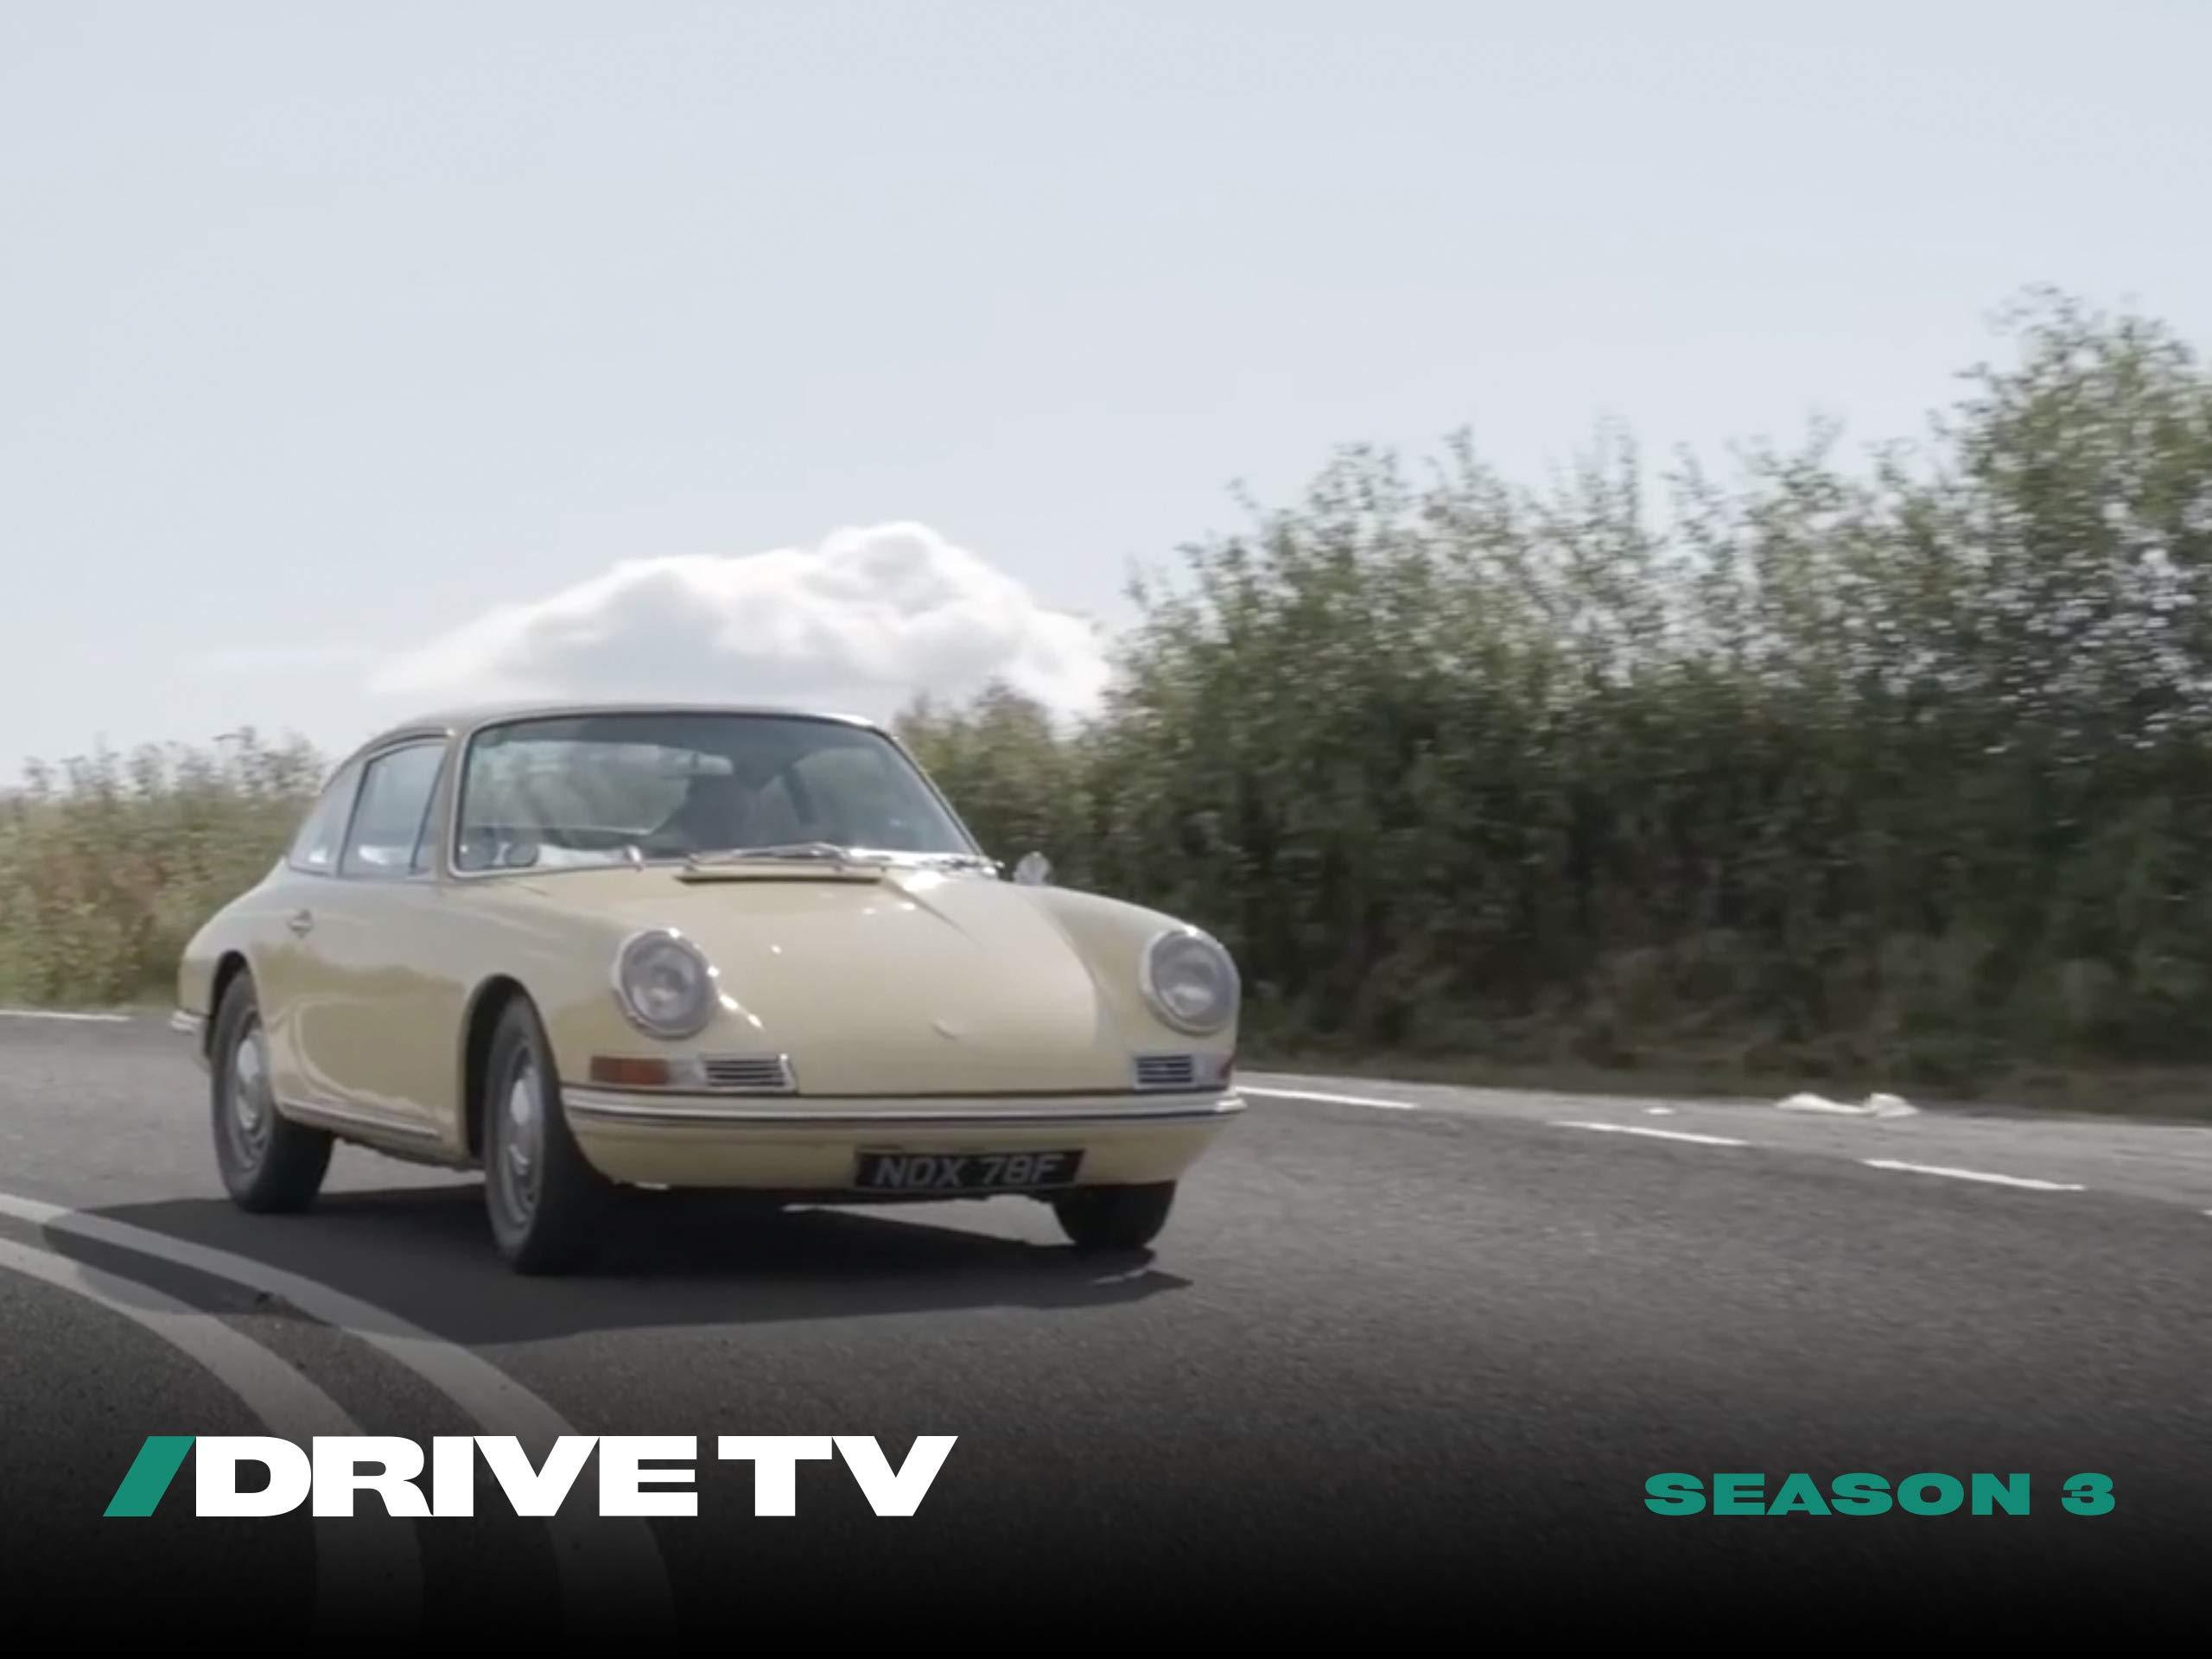 DriveTV